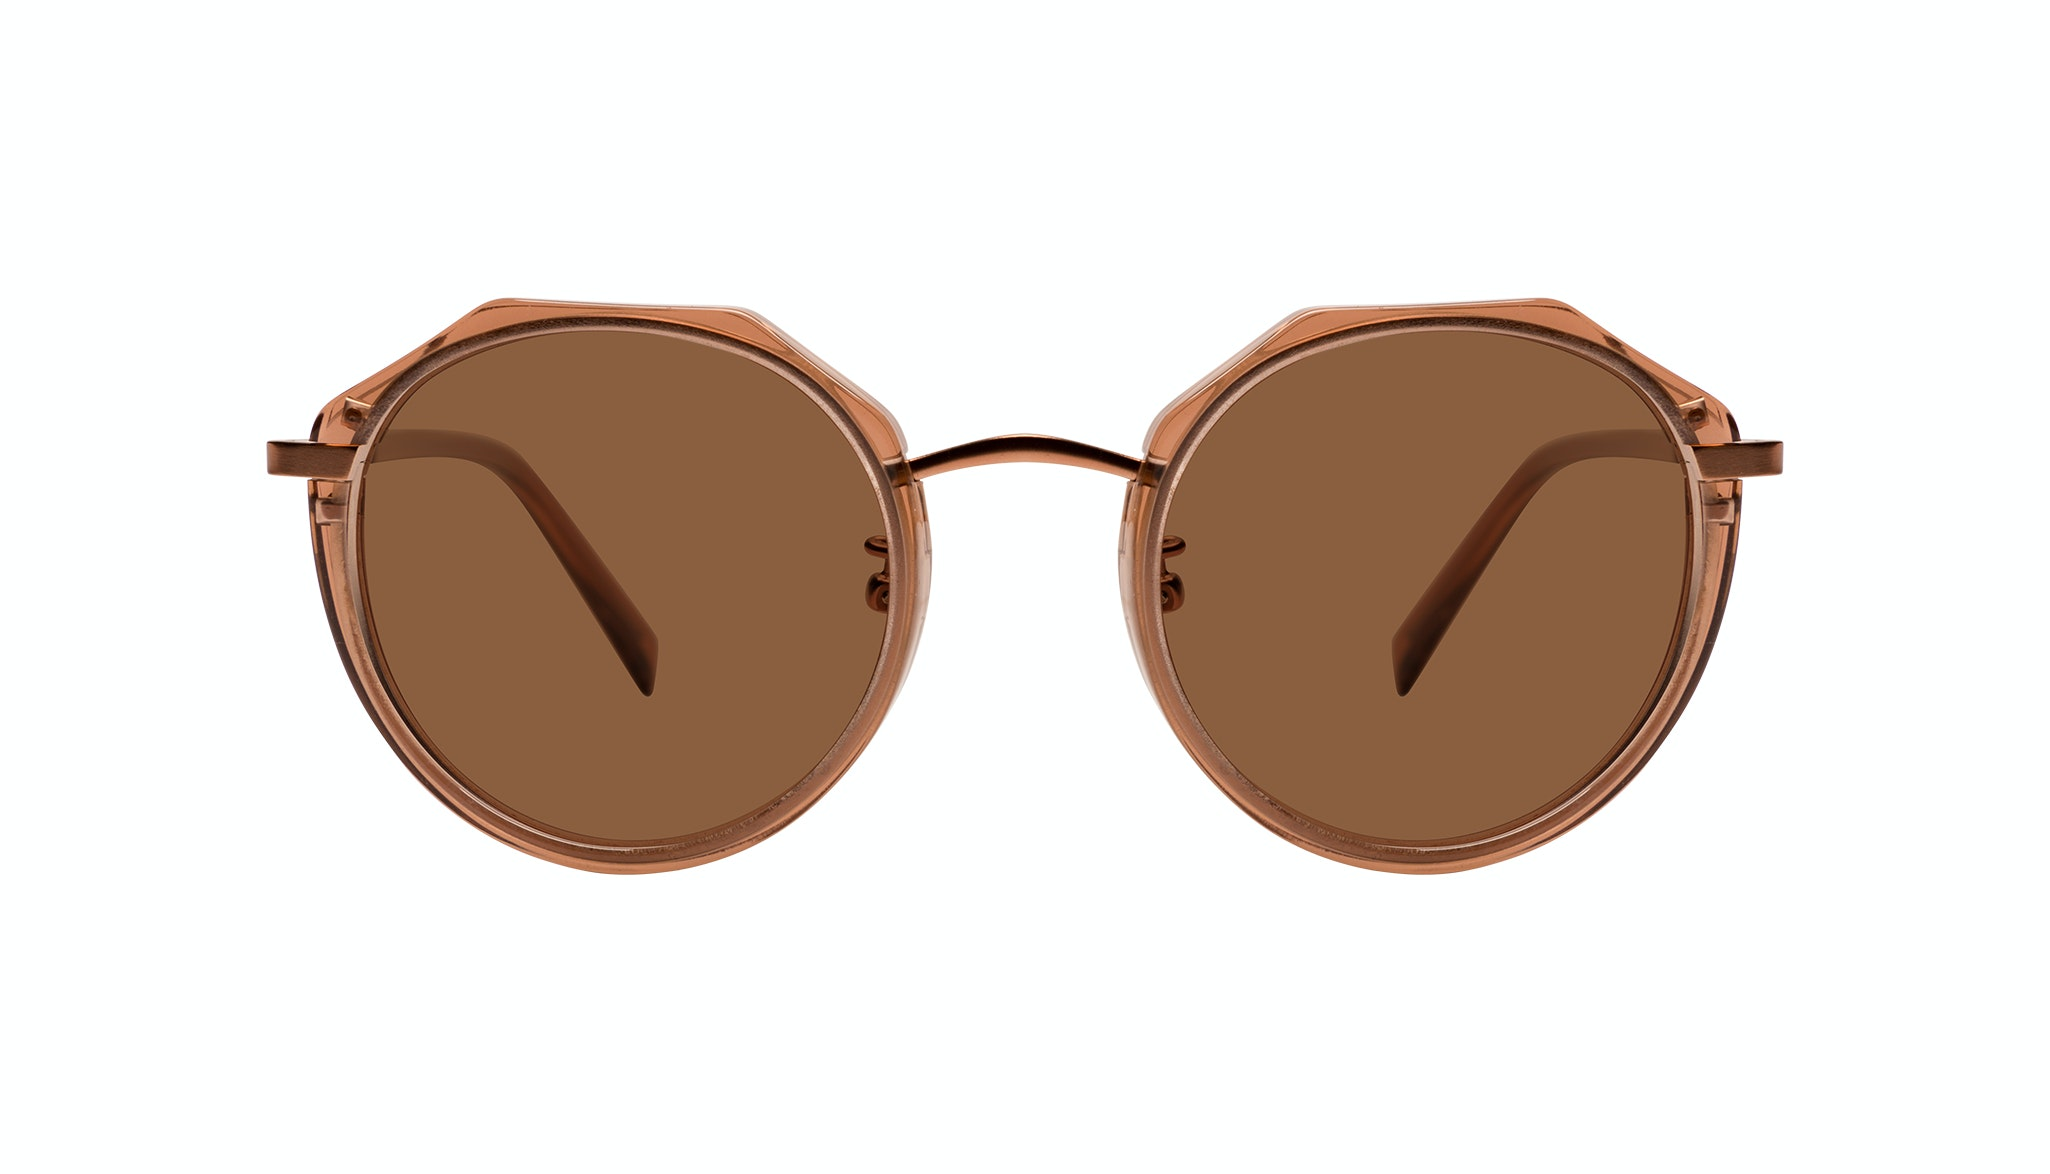 Affordable Fashion Glasses Round Sunglasses Women Womance Jules